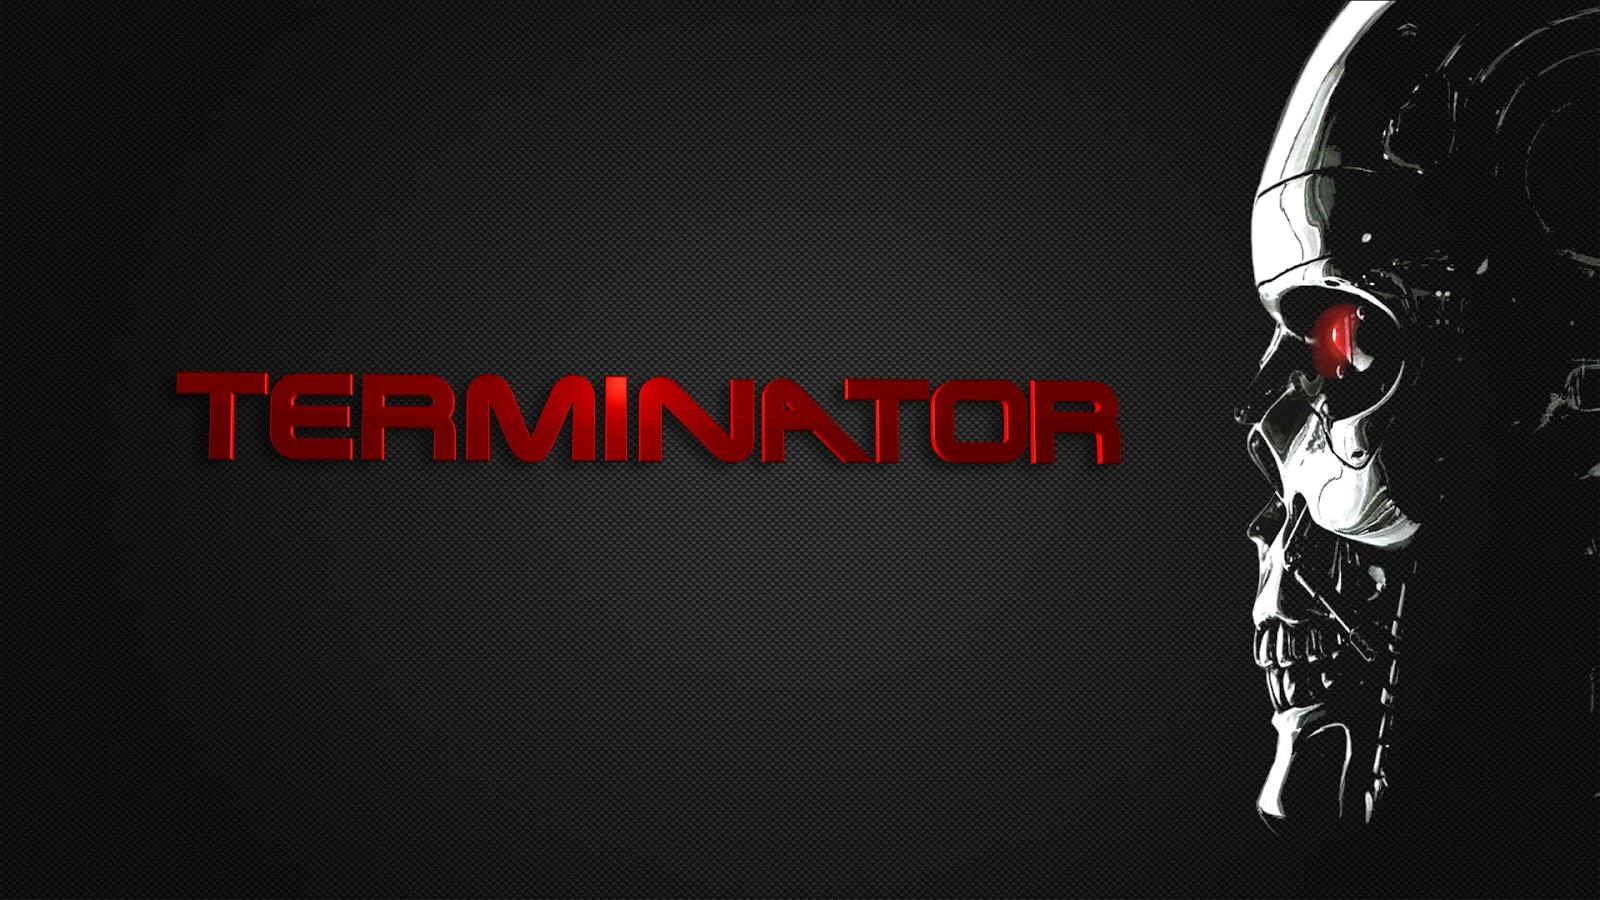 http://4.bp.blogspot.com/-MvlHNbykp2I/UBKgKxb7FrI/AAAAAAAAC9M/ZHRhZ5KJoPQ/s1600/Terminator1.jpg